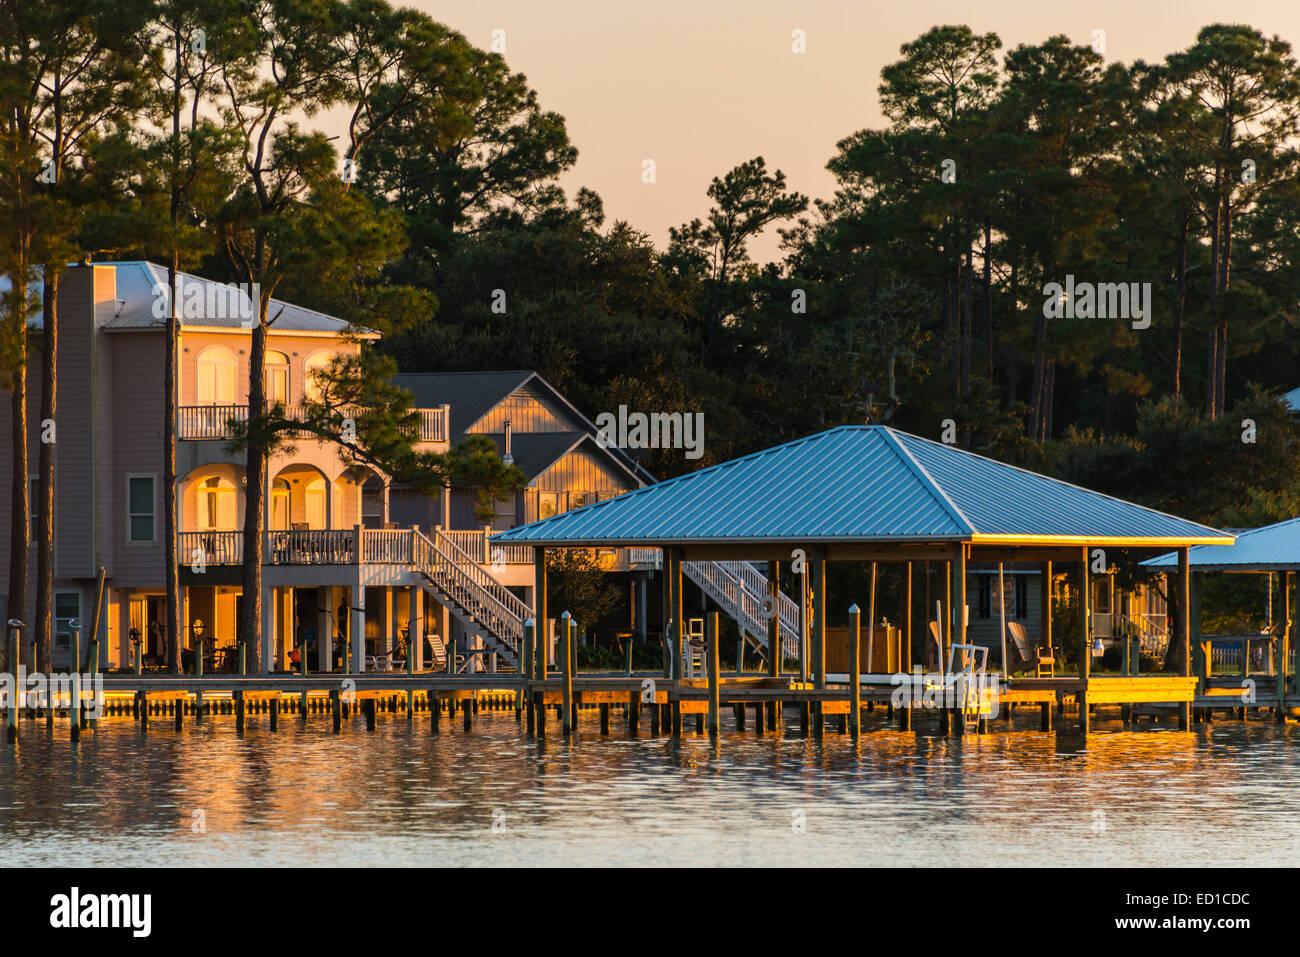 Homes along Wolf Bay near Cetacean Cruises dock, Orange Beach, Alabama. - Stock Image